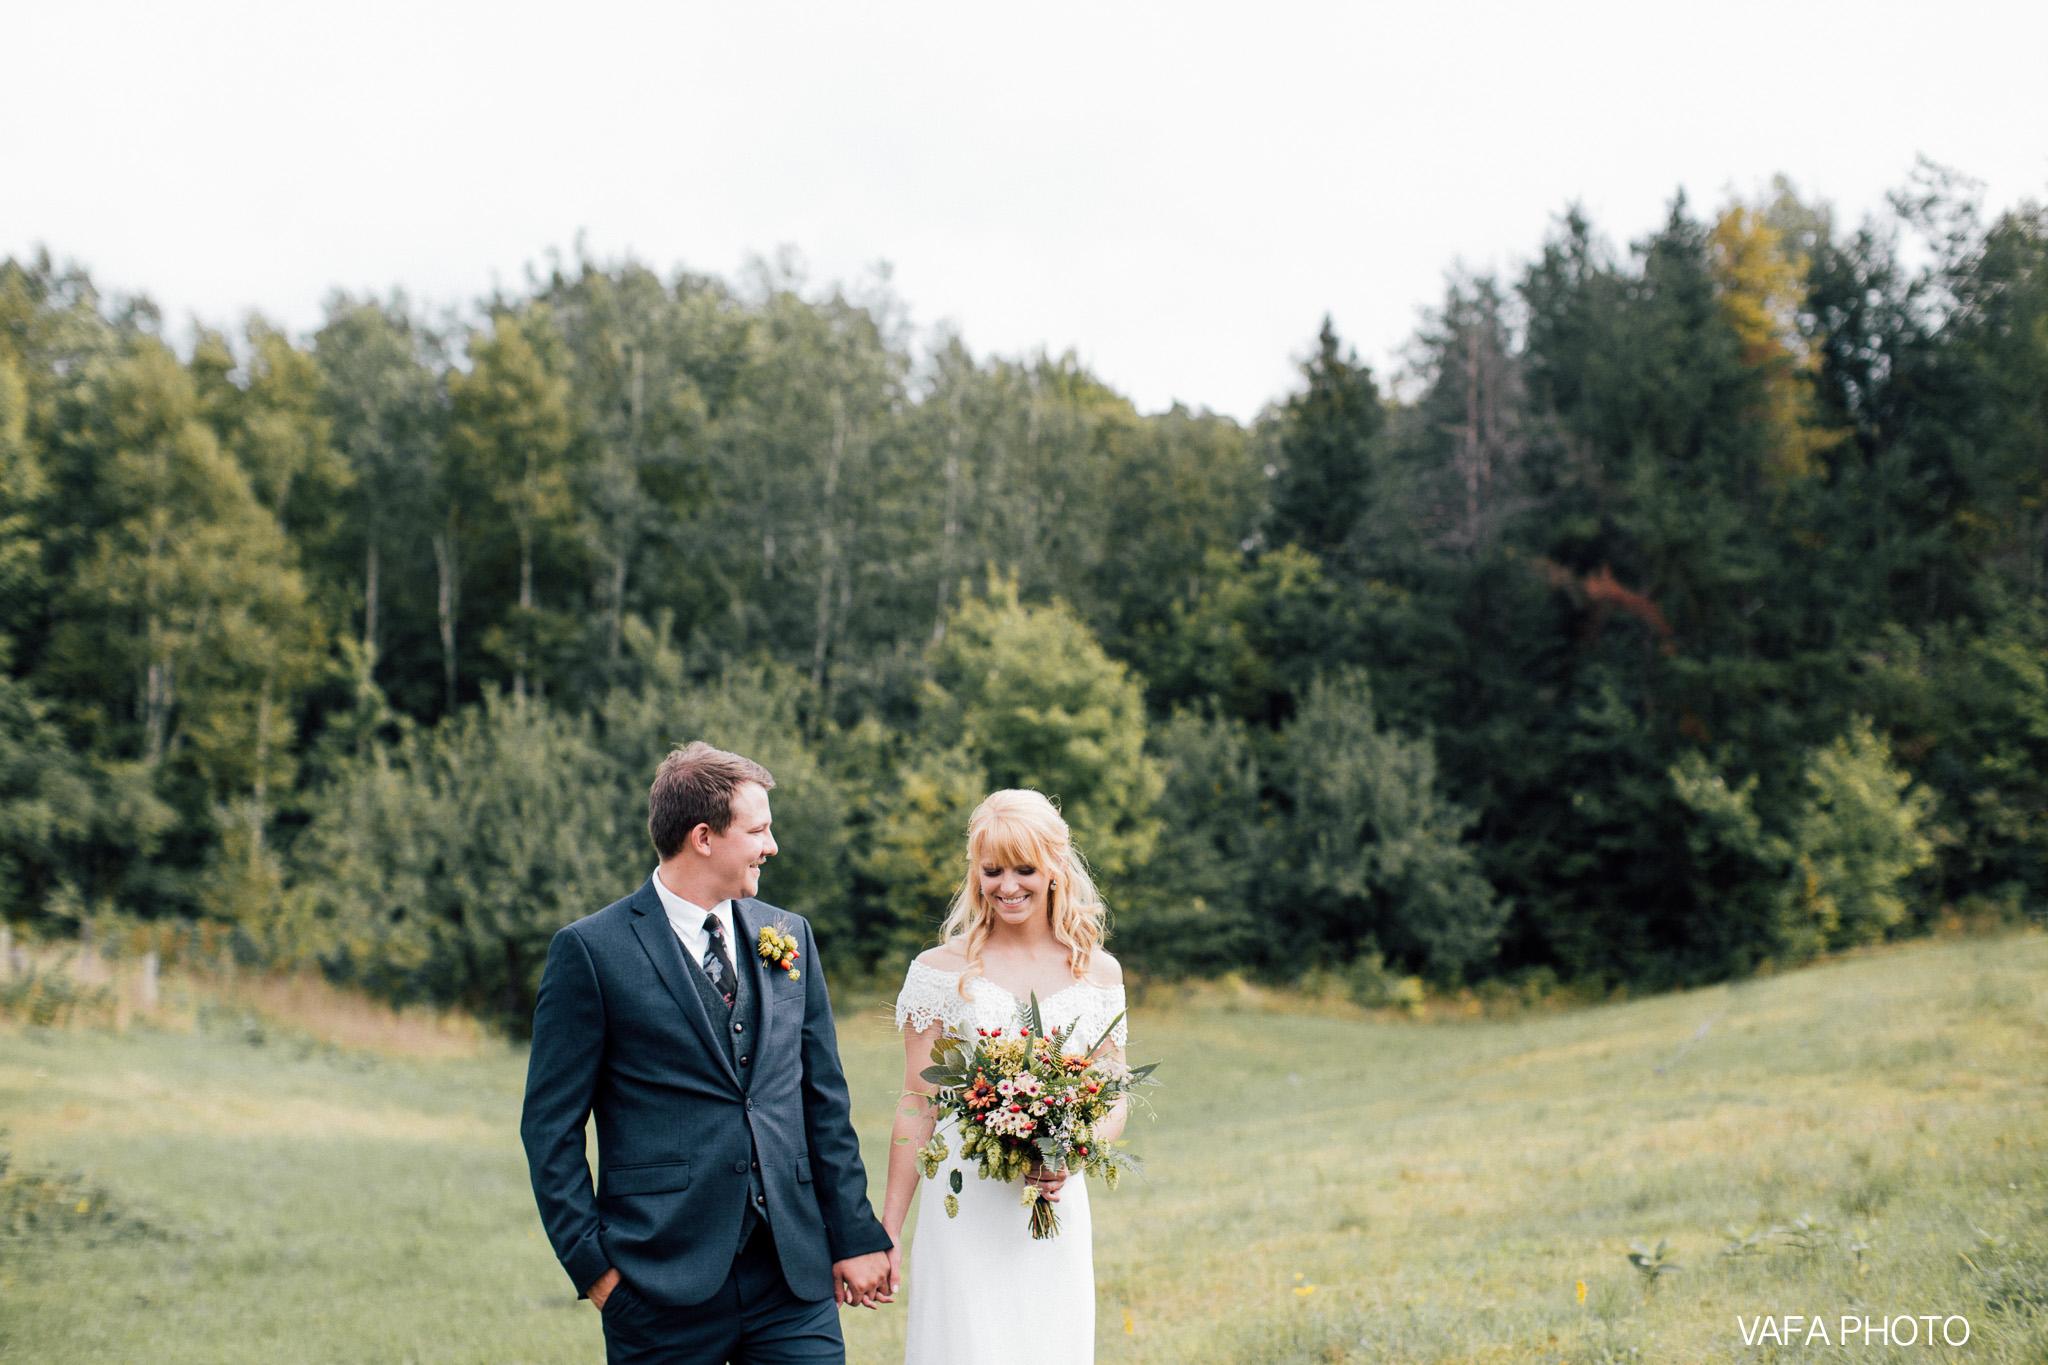 Belsolda-Farm-Wedding-Christy-Eric-Vafa-Photo-173.jpg